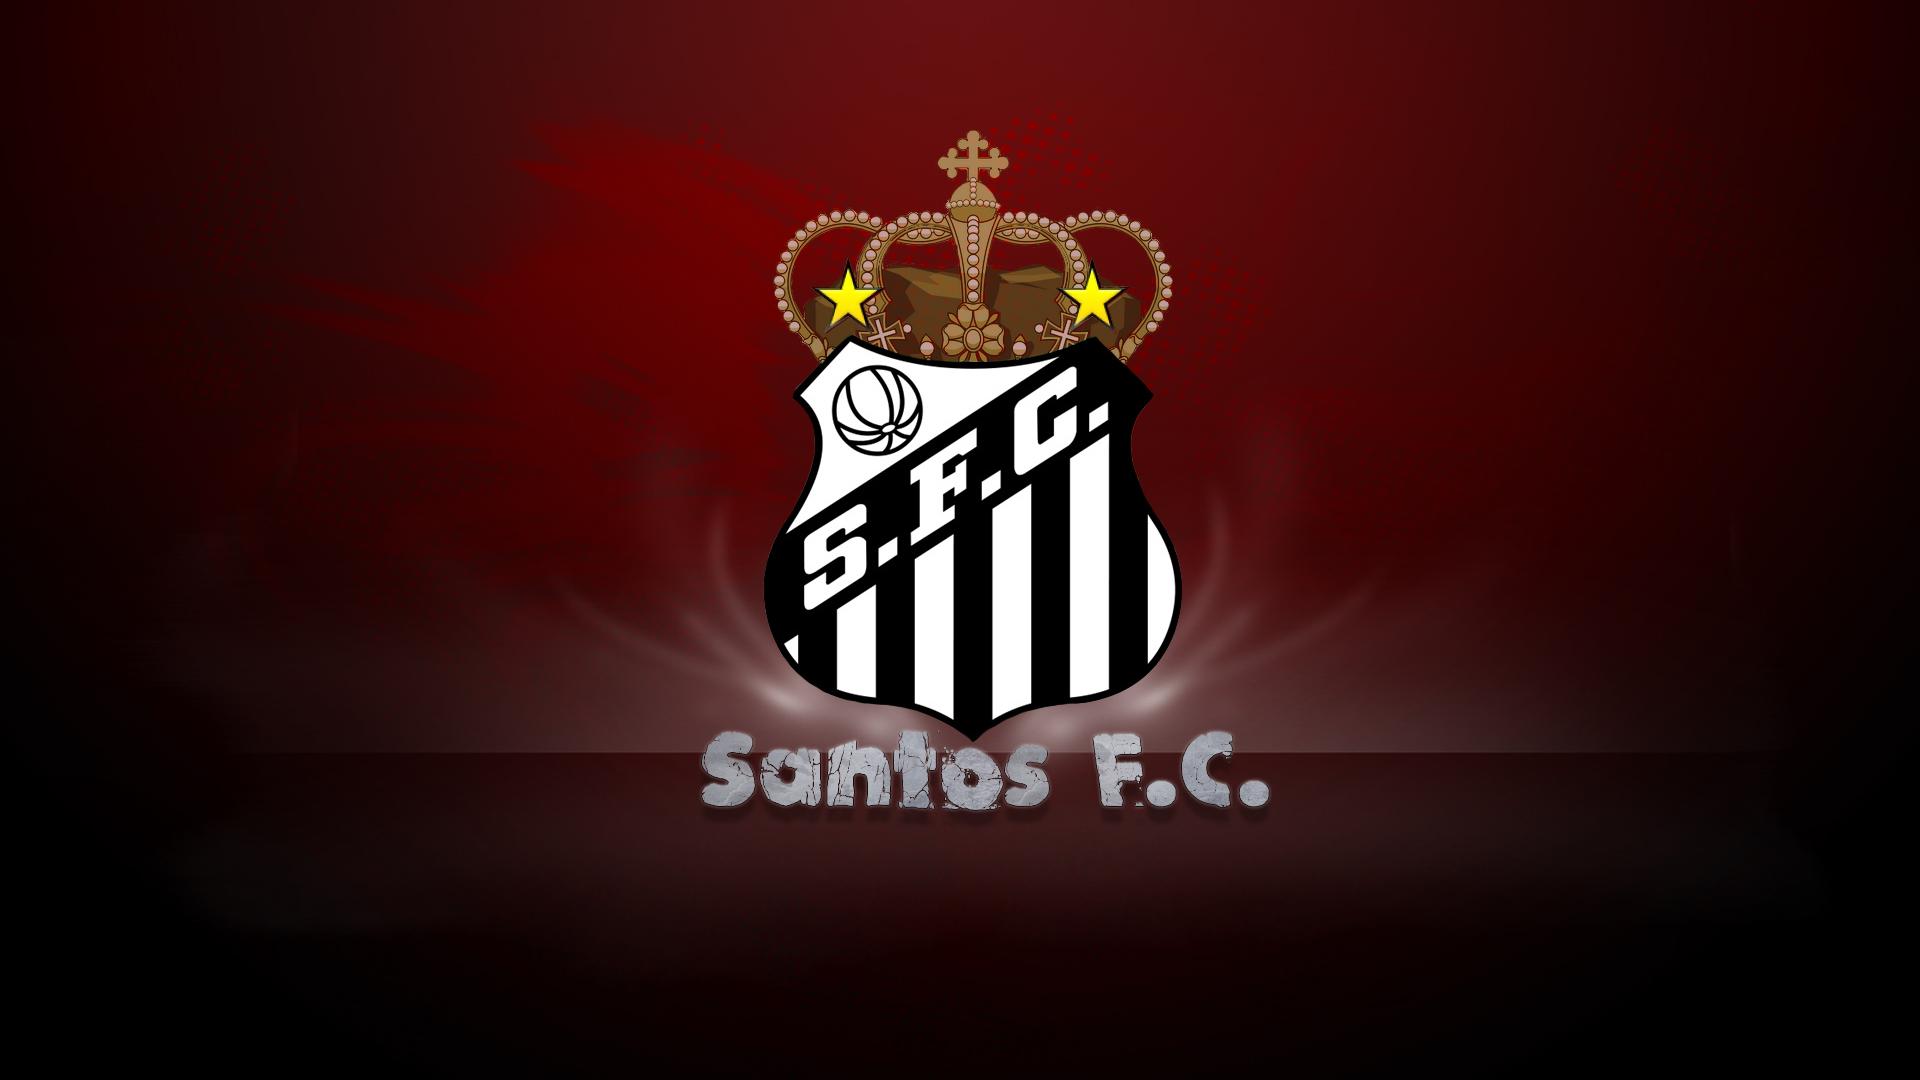 Santos FC HD Wallpaper Background Image 1920x1080 ID985373 1920x1080